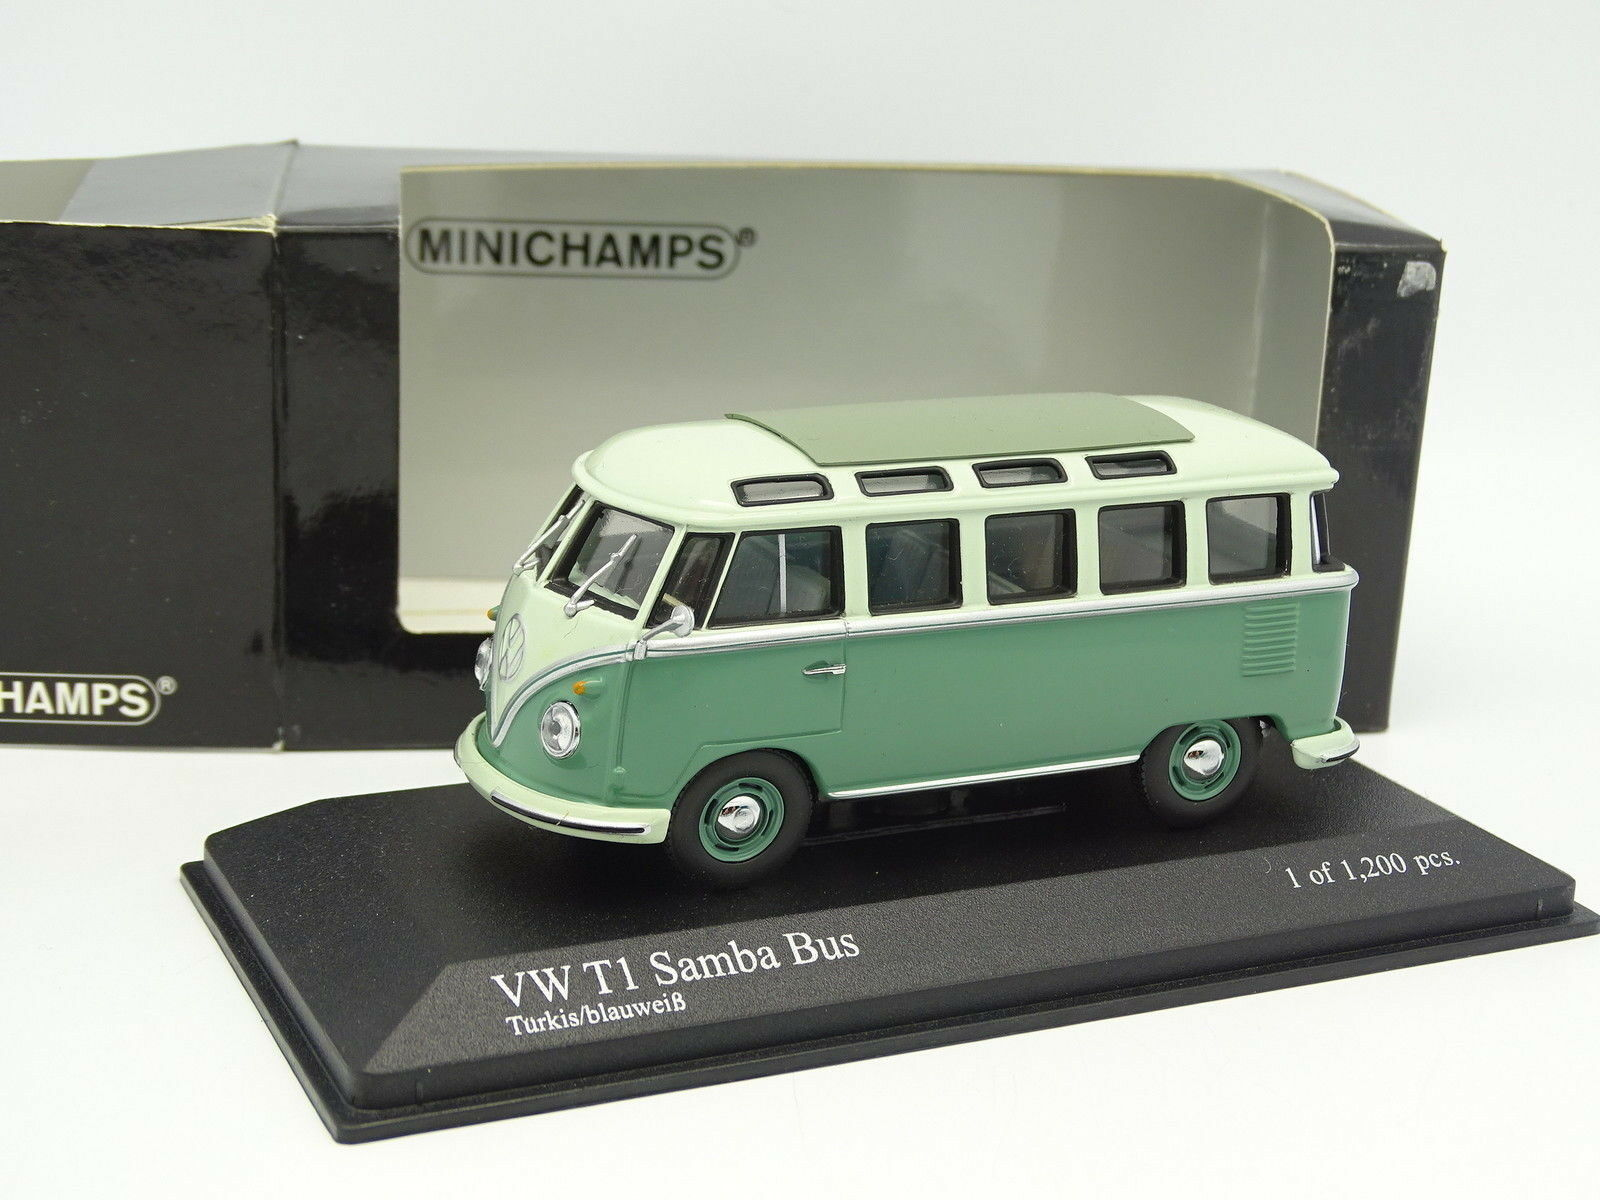 Minichamps 1 43 43 43 - VW Combi T1 Samba Bus Turkis blueweiss 32217b